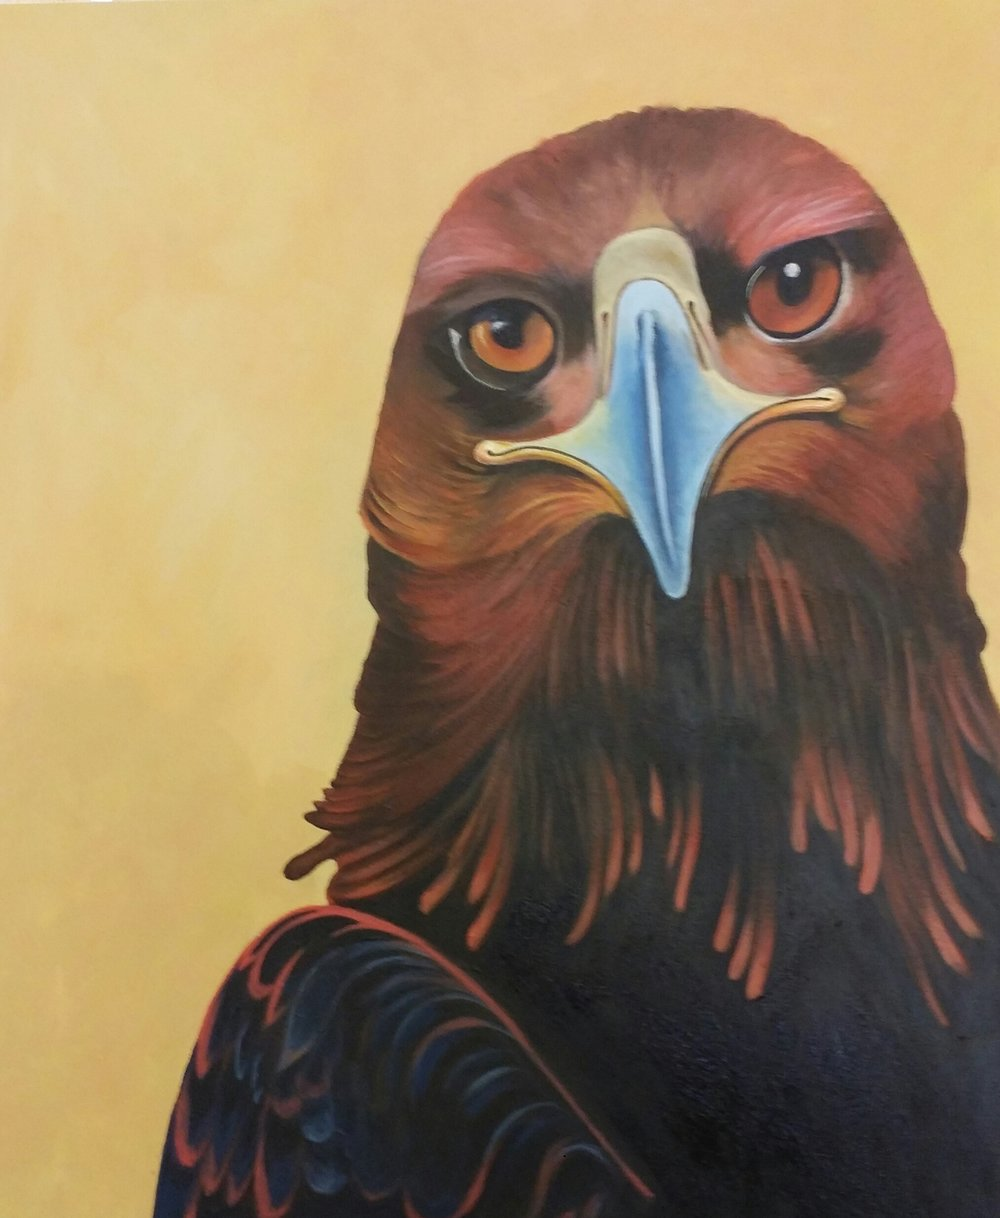 MONTY'S GOLDEN EAGLE